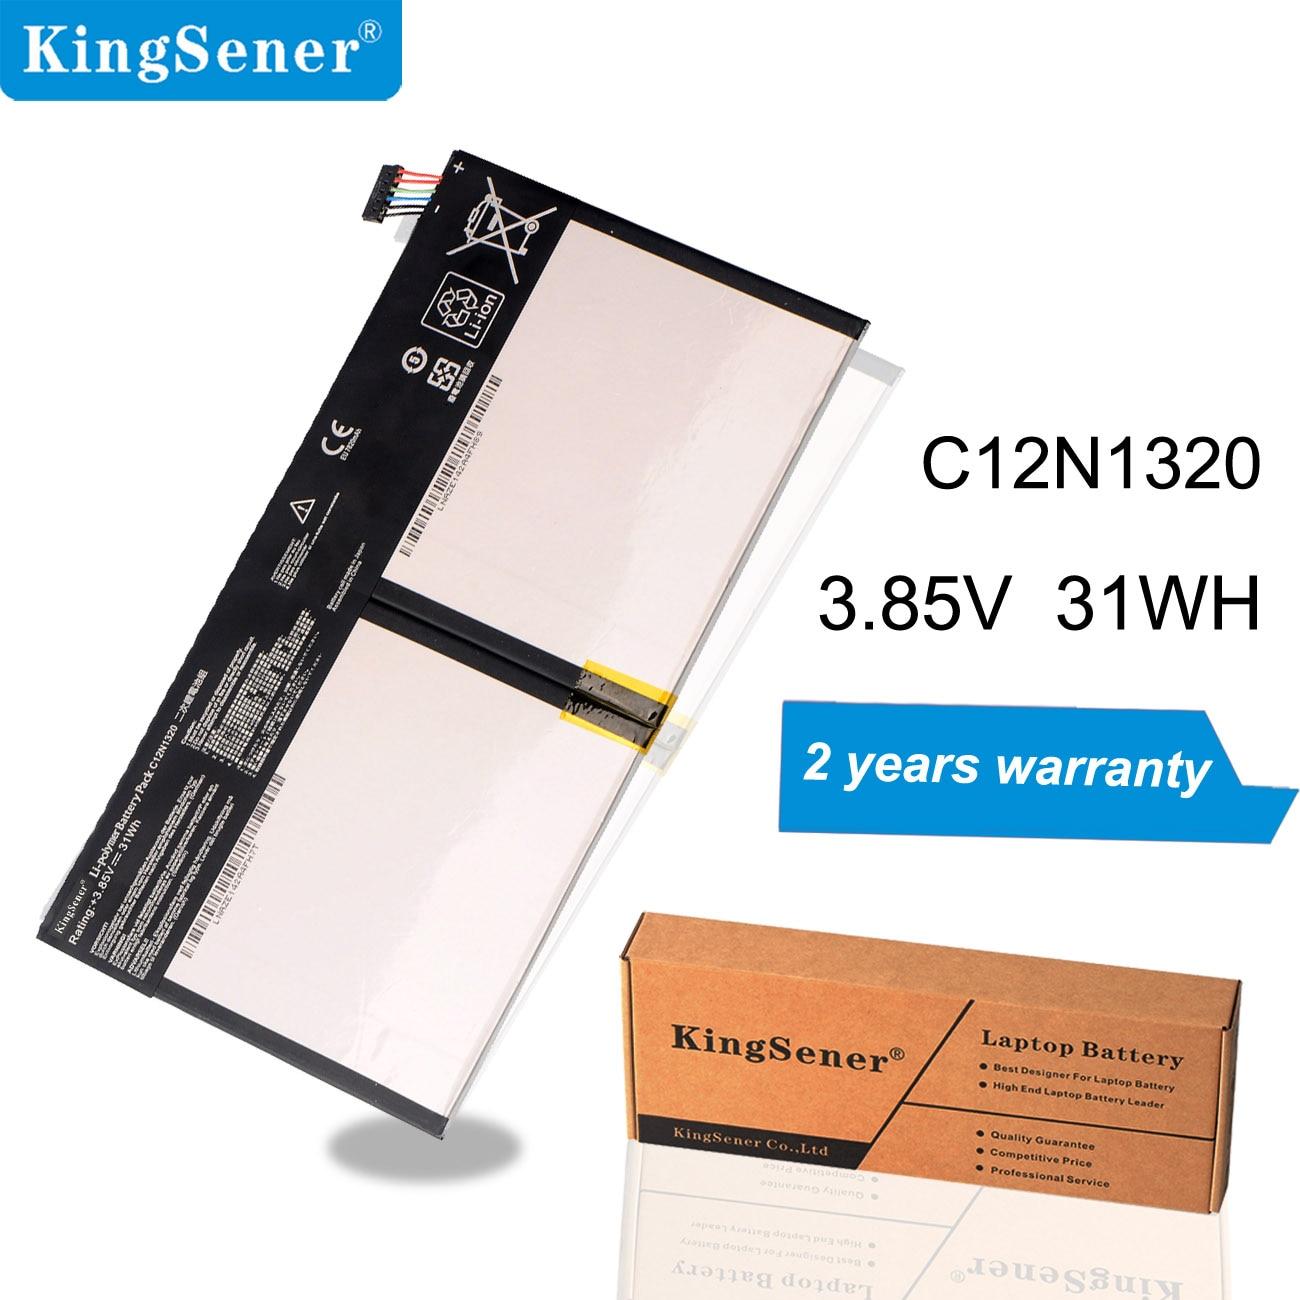 KingSener C12N1320 New Battery For ASUS Transformer Book T100 T100T T100TA T100TA-C1 Series 3.85V 31WH